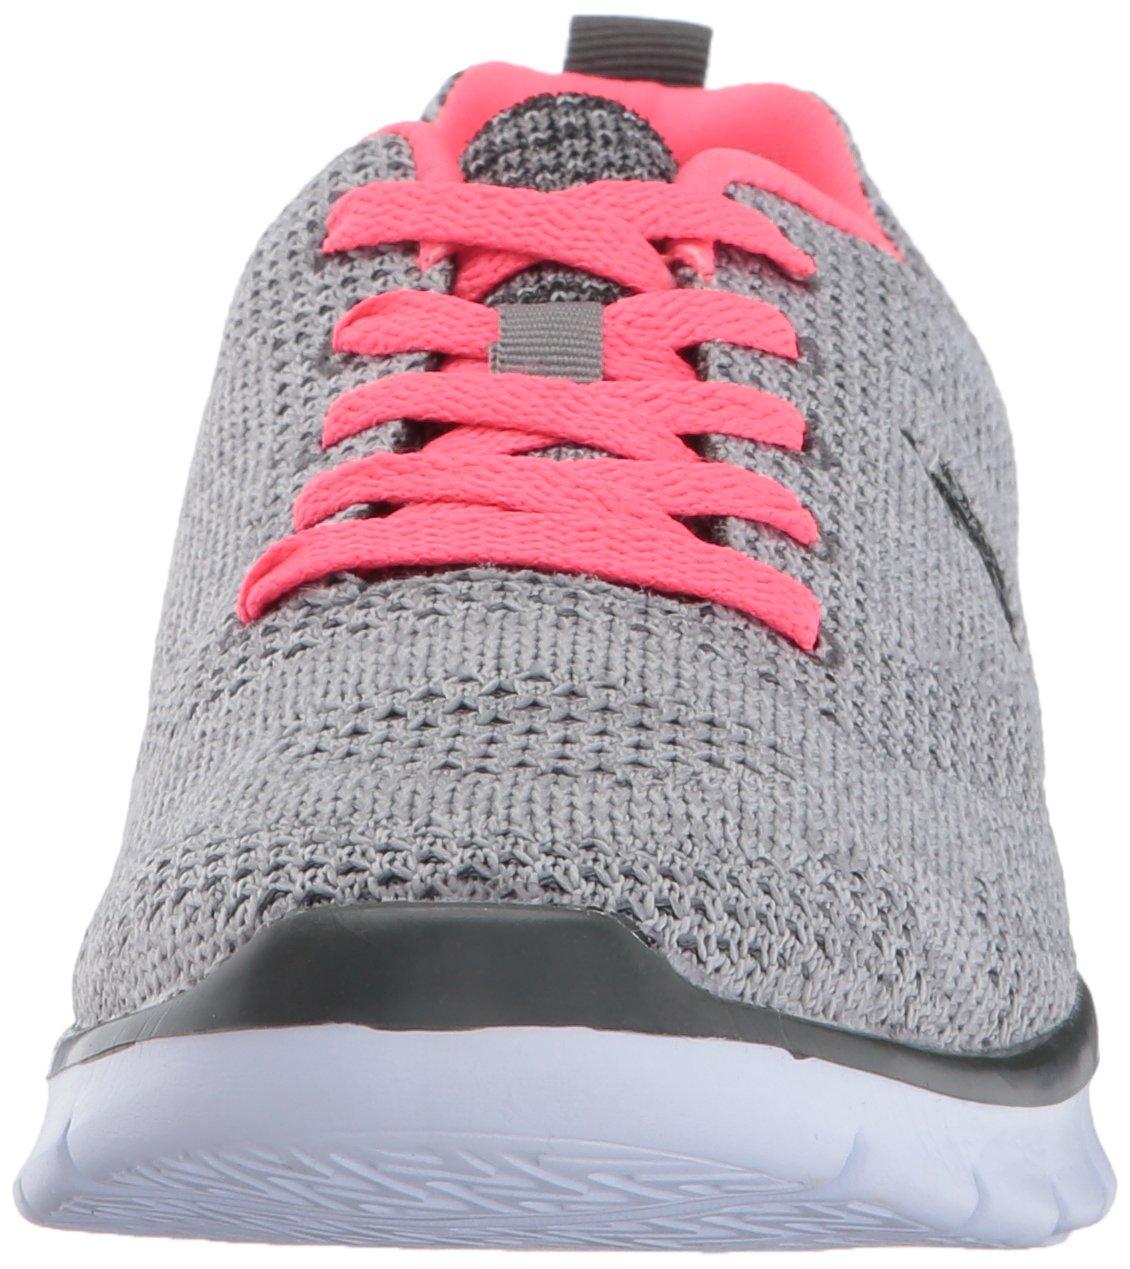 U.S. Polo Assn. Women's Women's Emery-k Fashion Sneaker B01MUYDWMD 7.5 B(M) US|Grey/Neon Coral